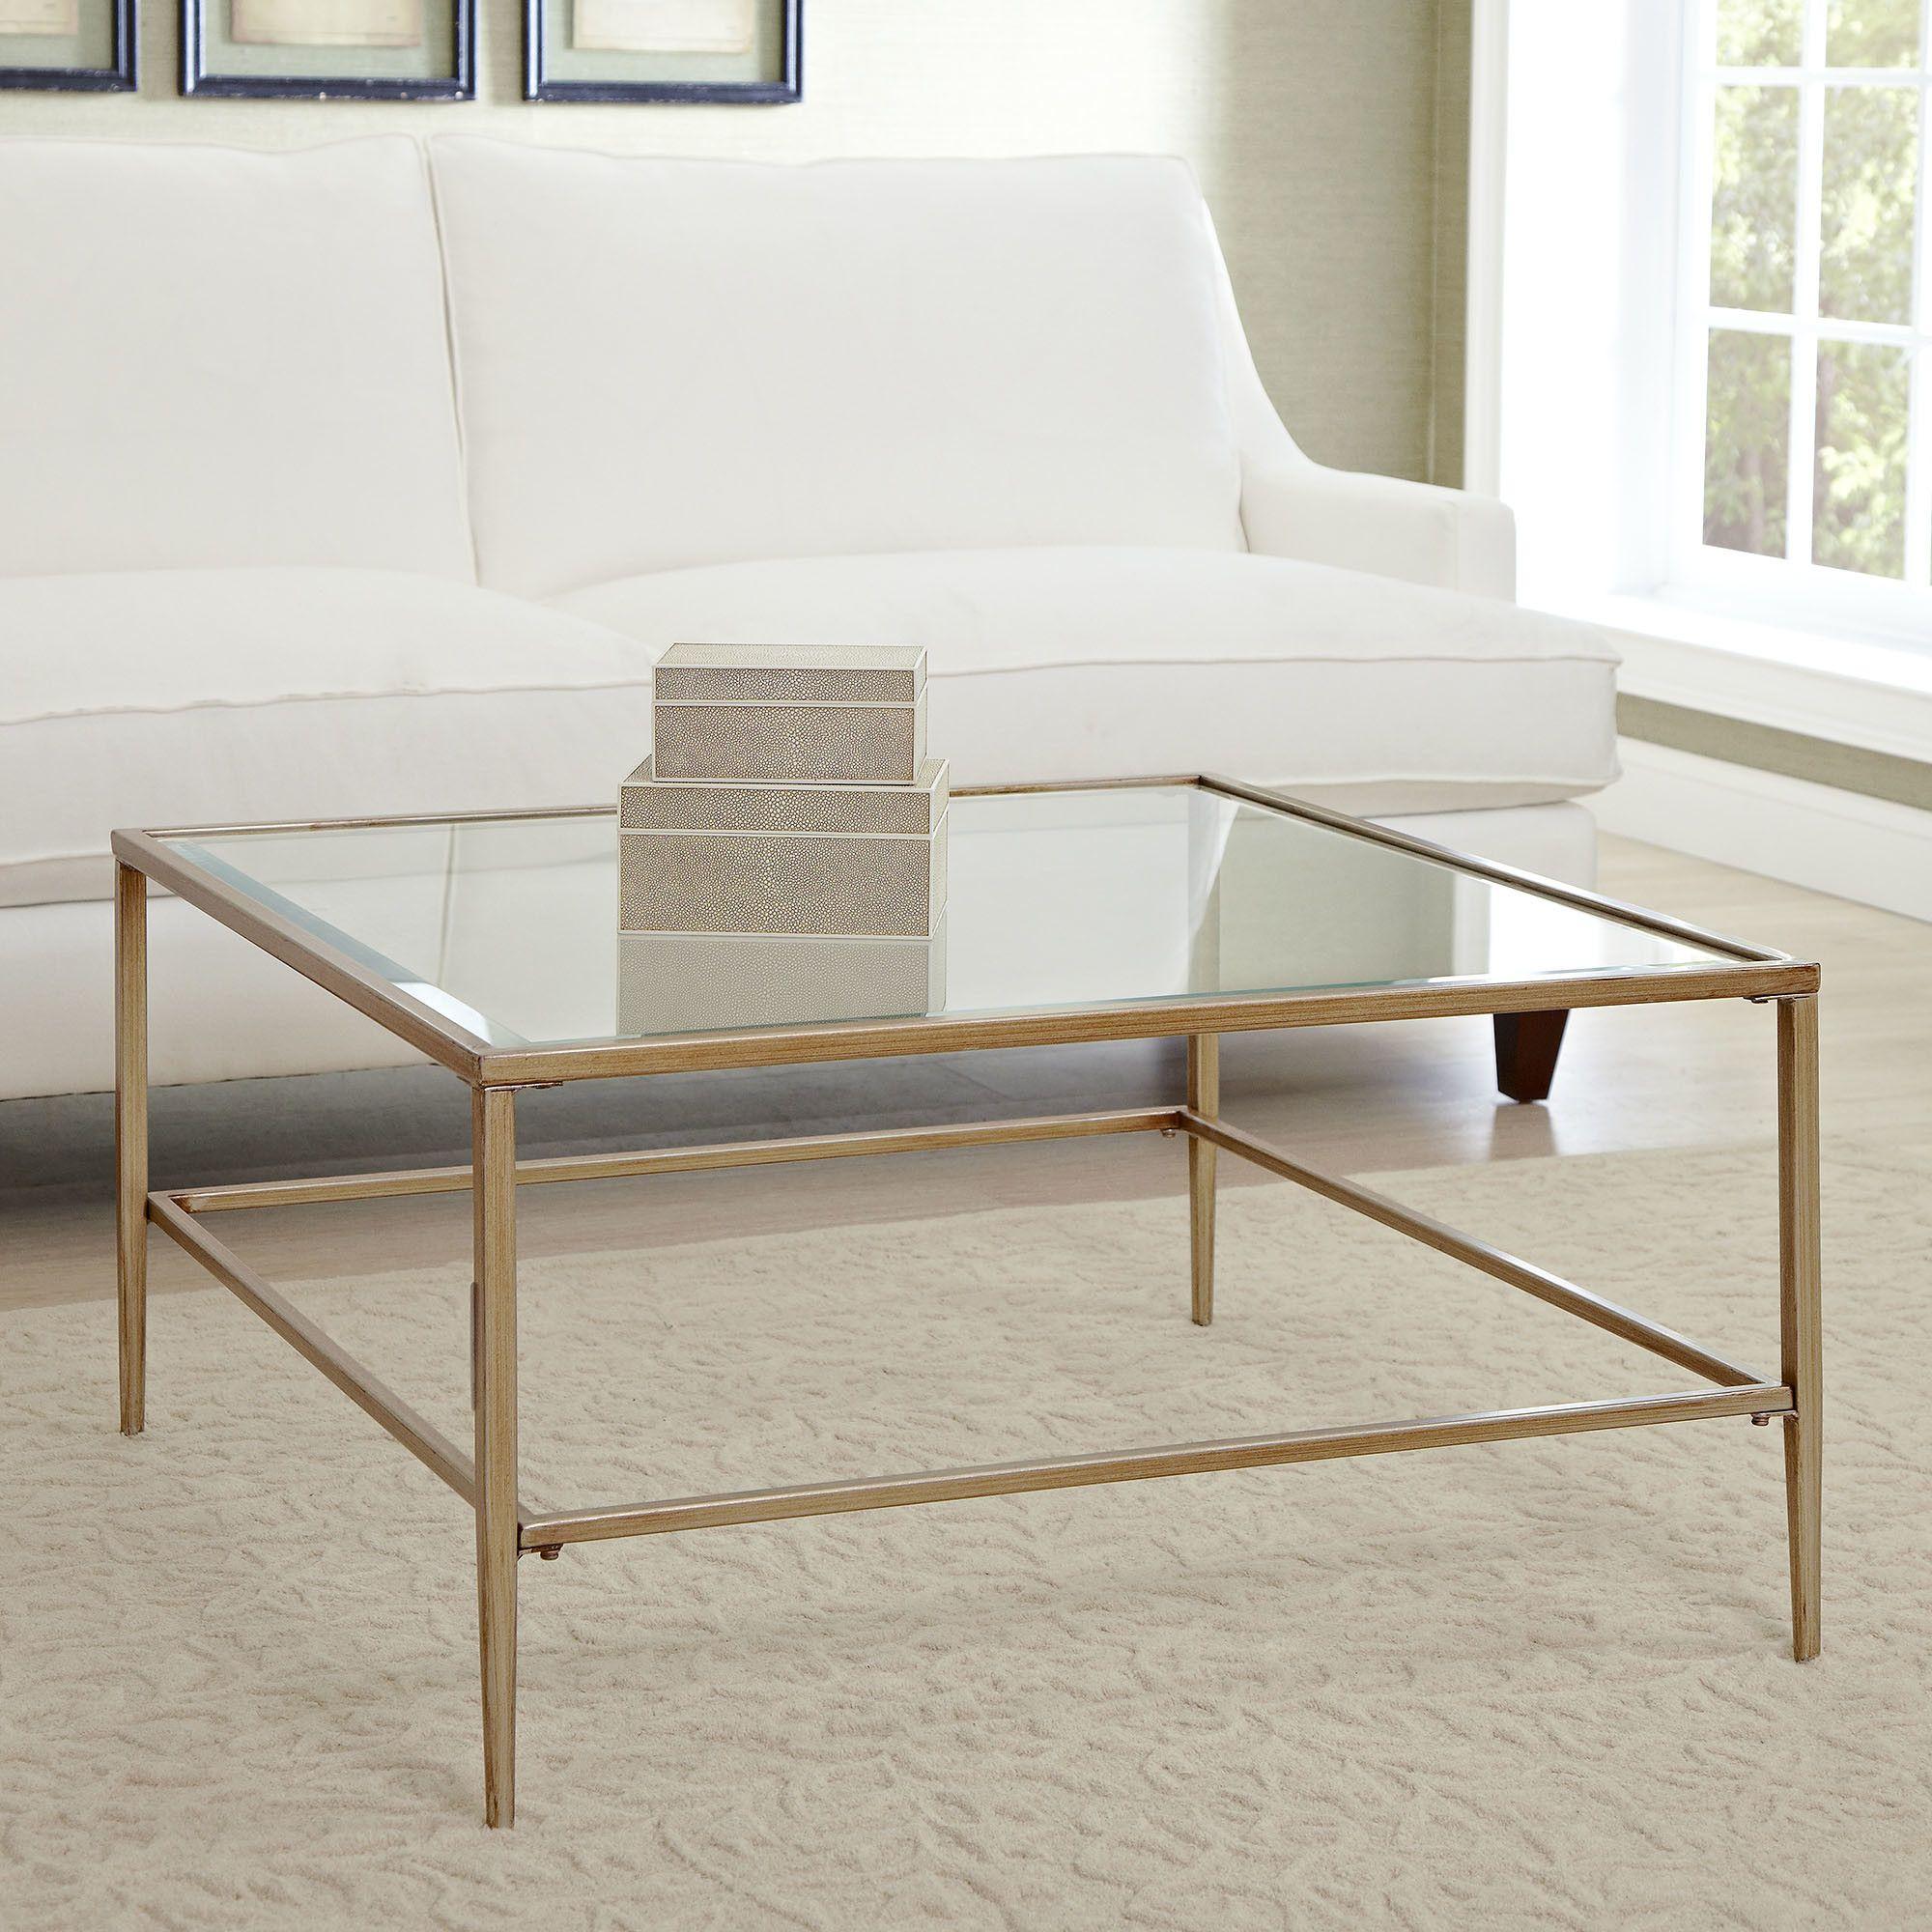 Glass Square Coffee Tables Joss Main Coffee Table Chic Coffee Table Coffee Table Square [ 3331 x 3331 Pixel ]